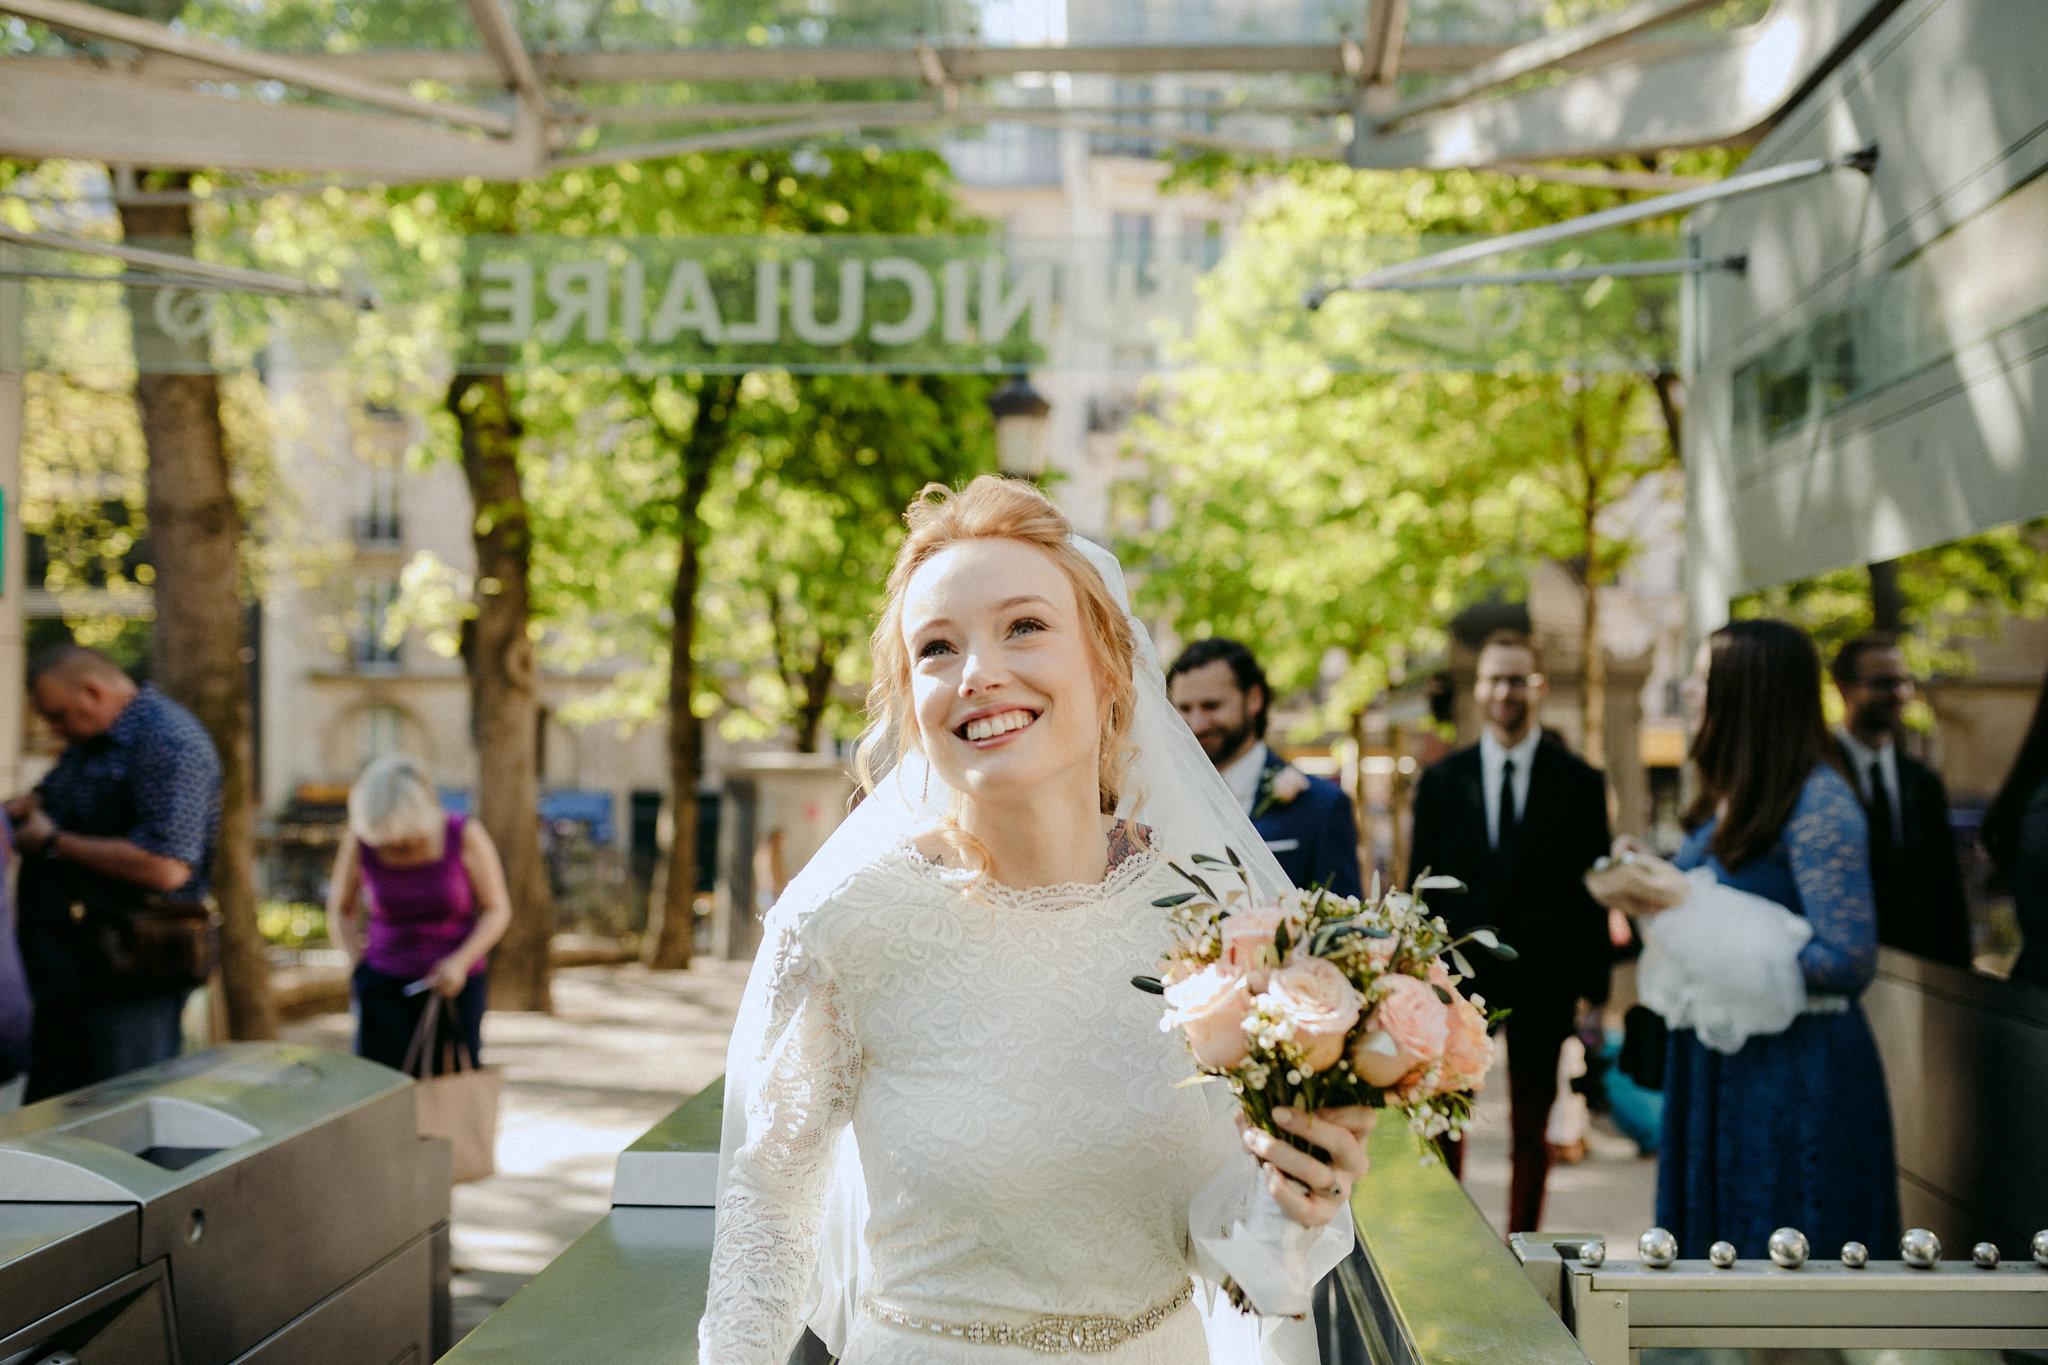 Paris_elopement_wedding_photographer-121.jpg